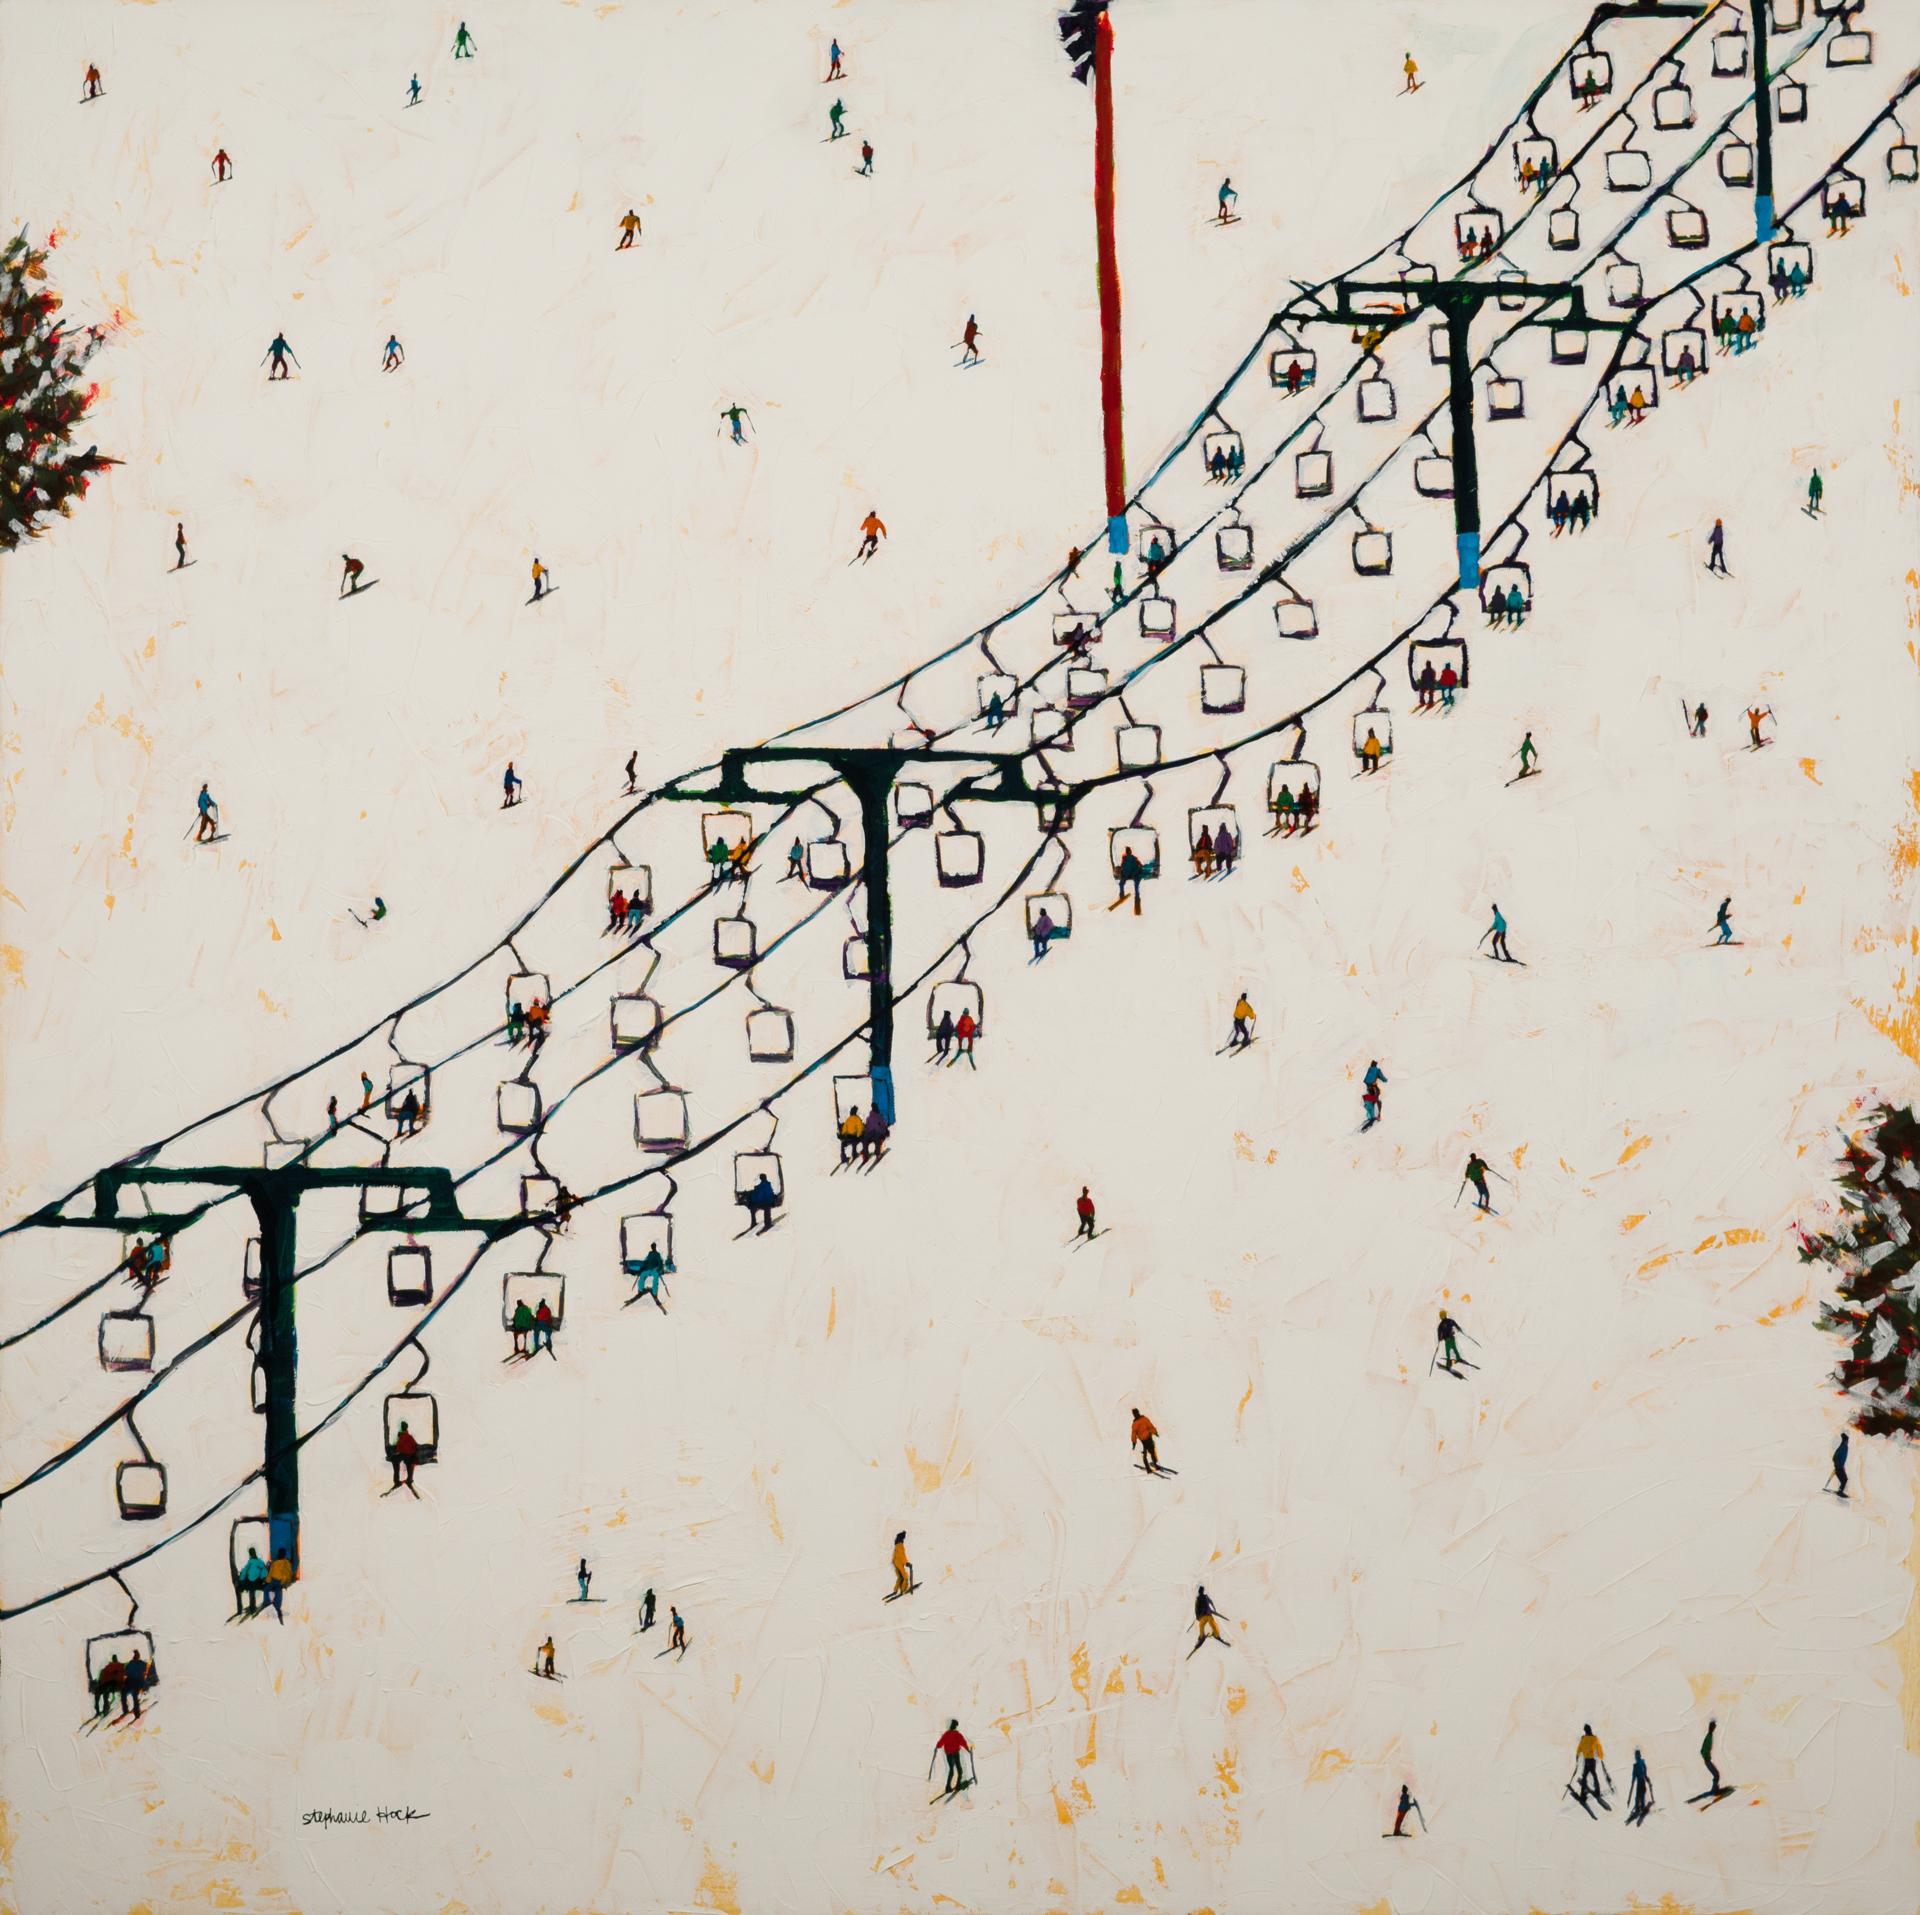 Ski Weekend by Stephanie Hock